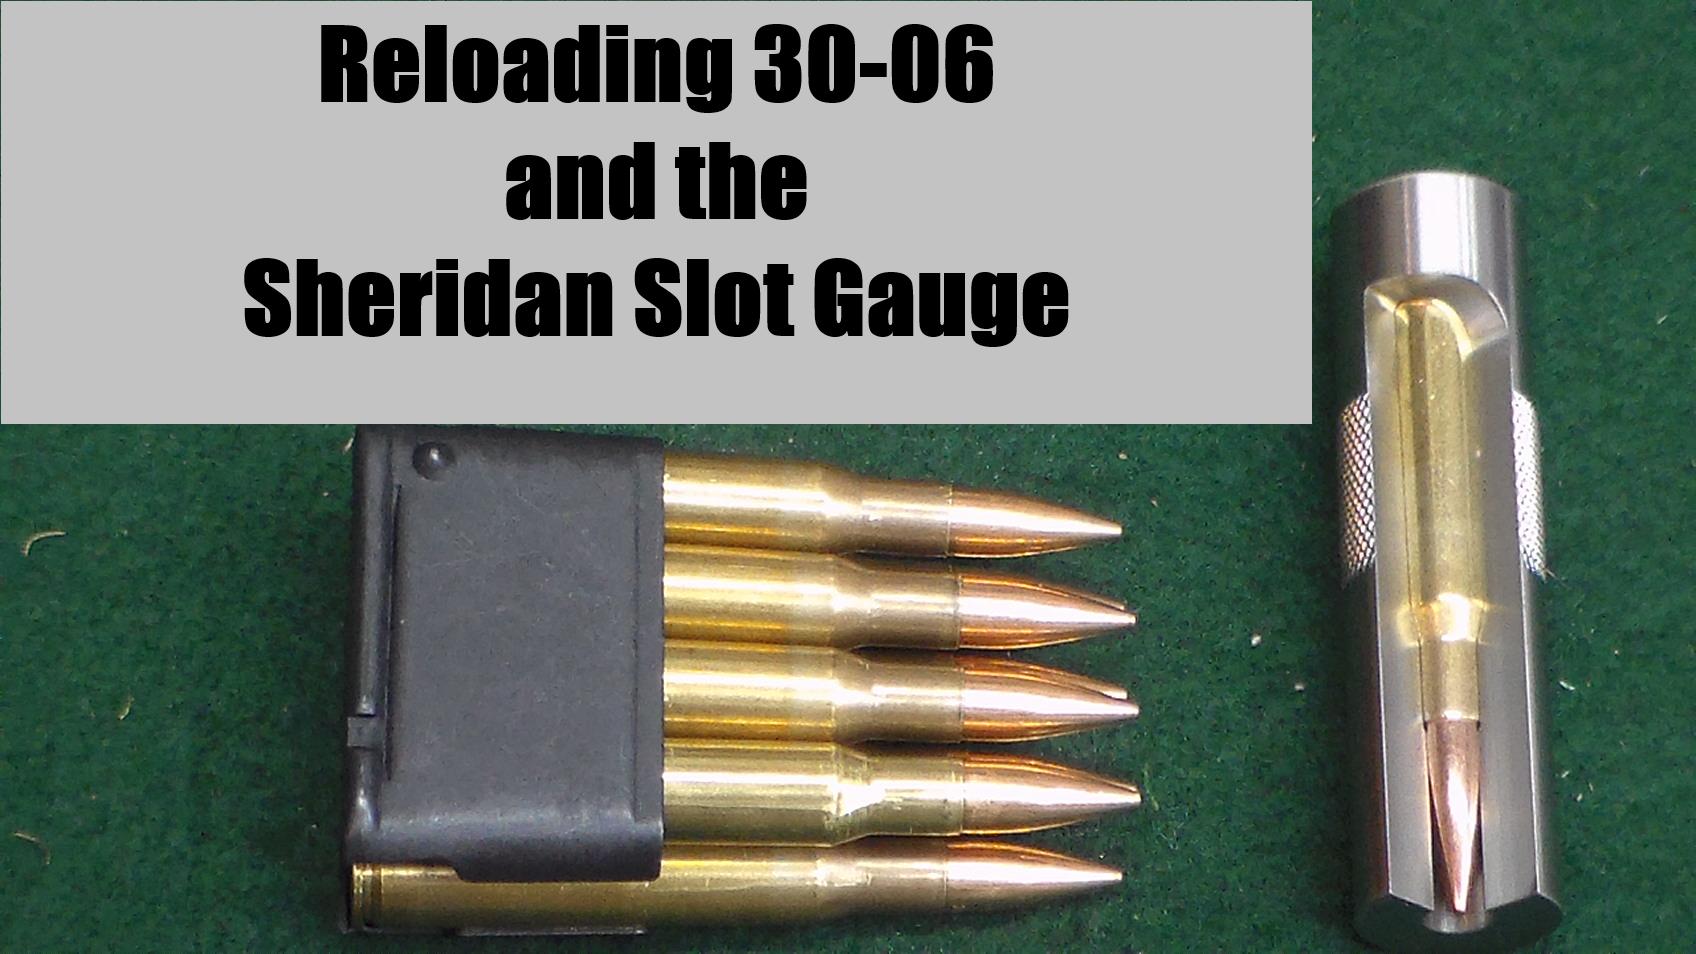 reloading 3006 sheridan gauge pic